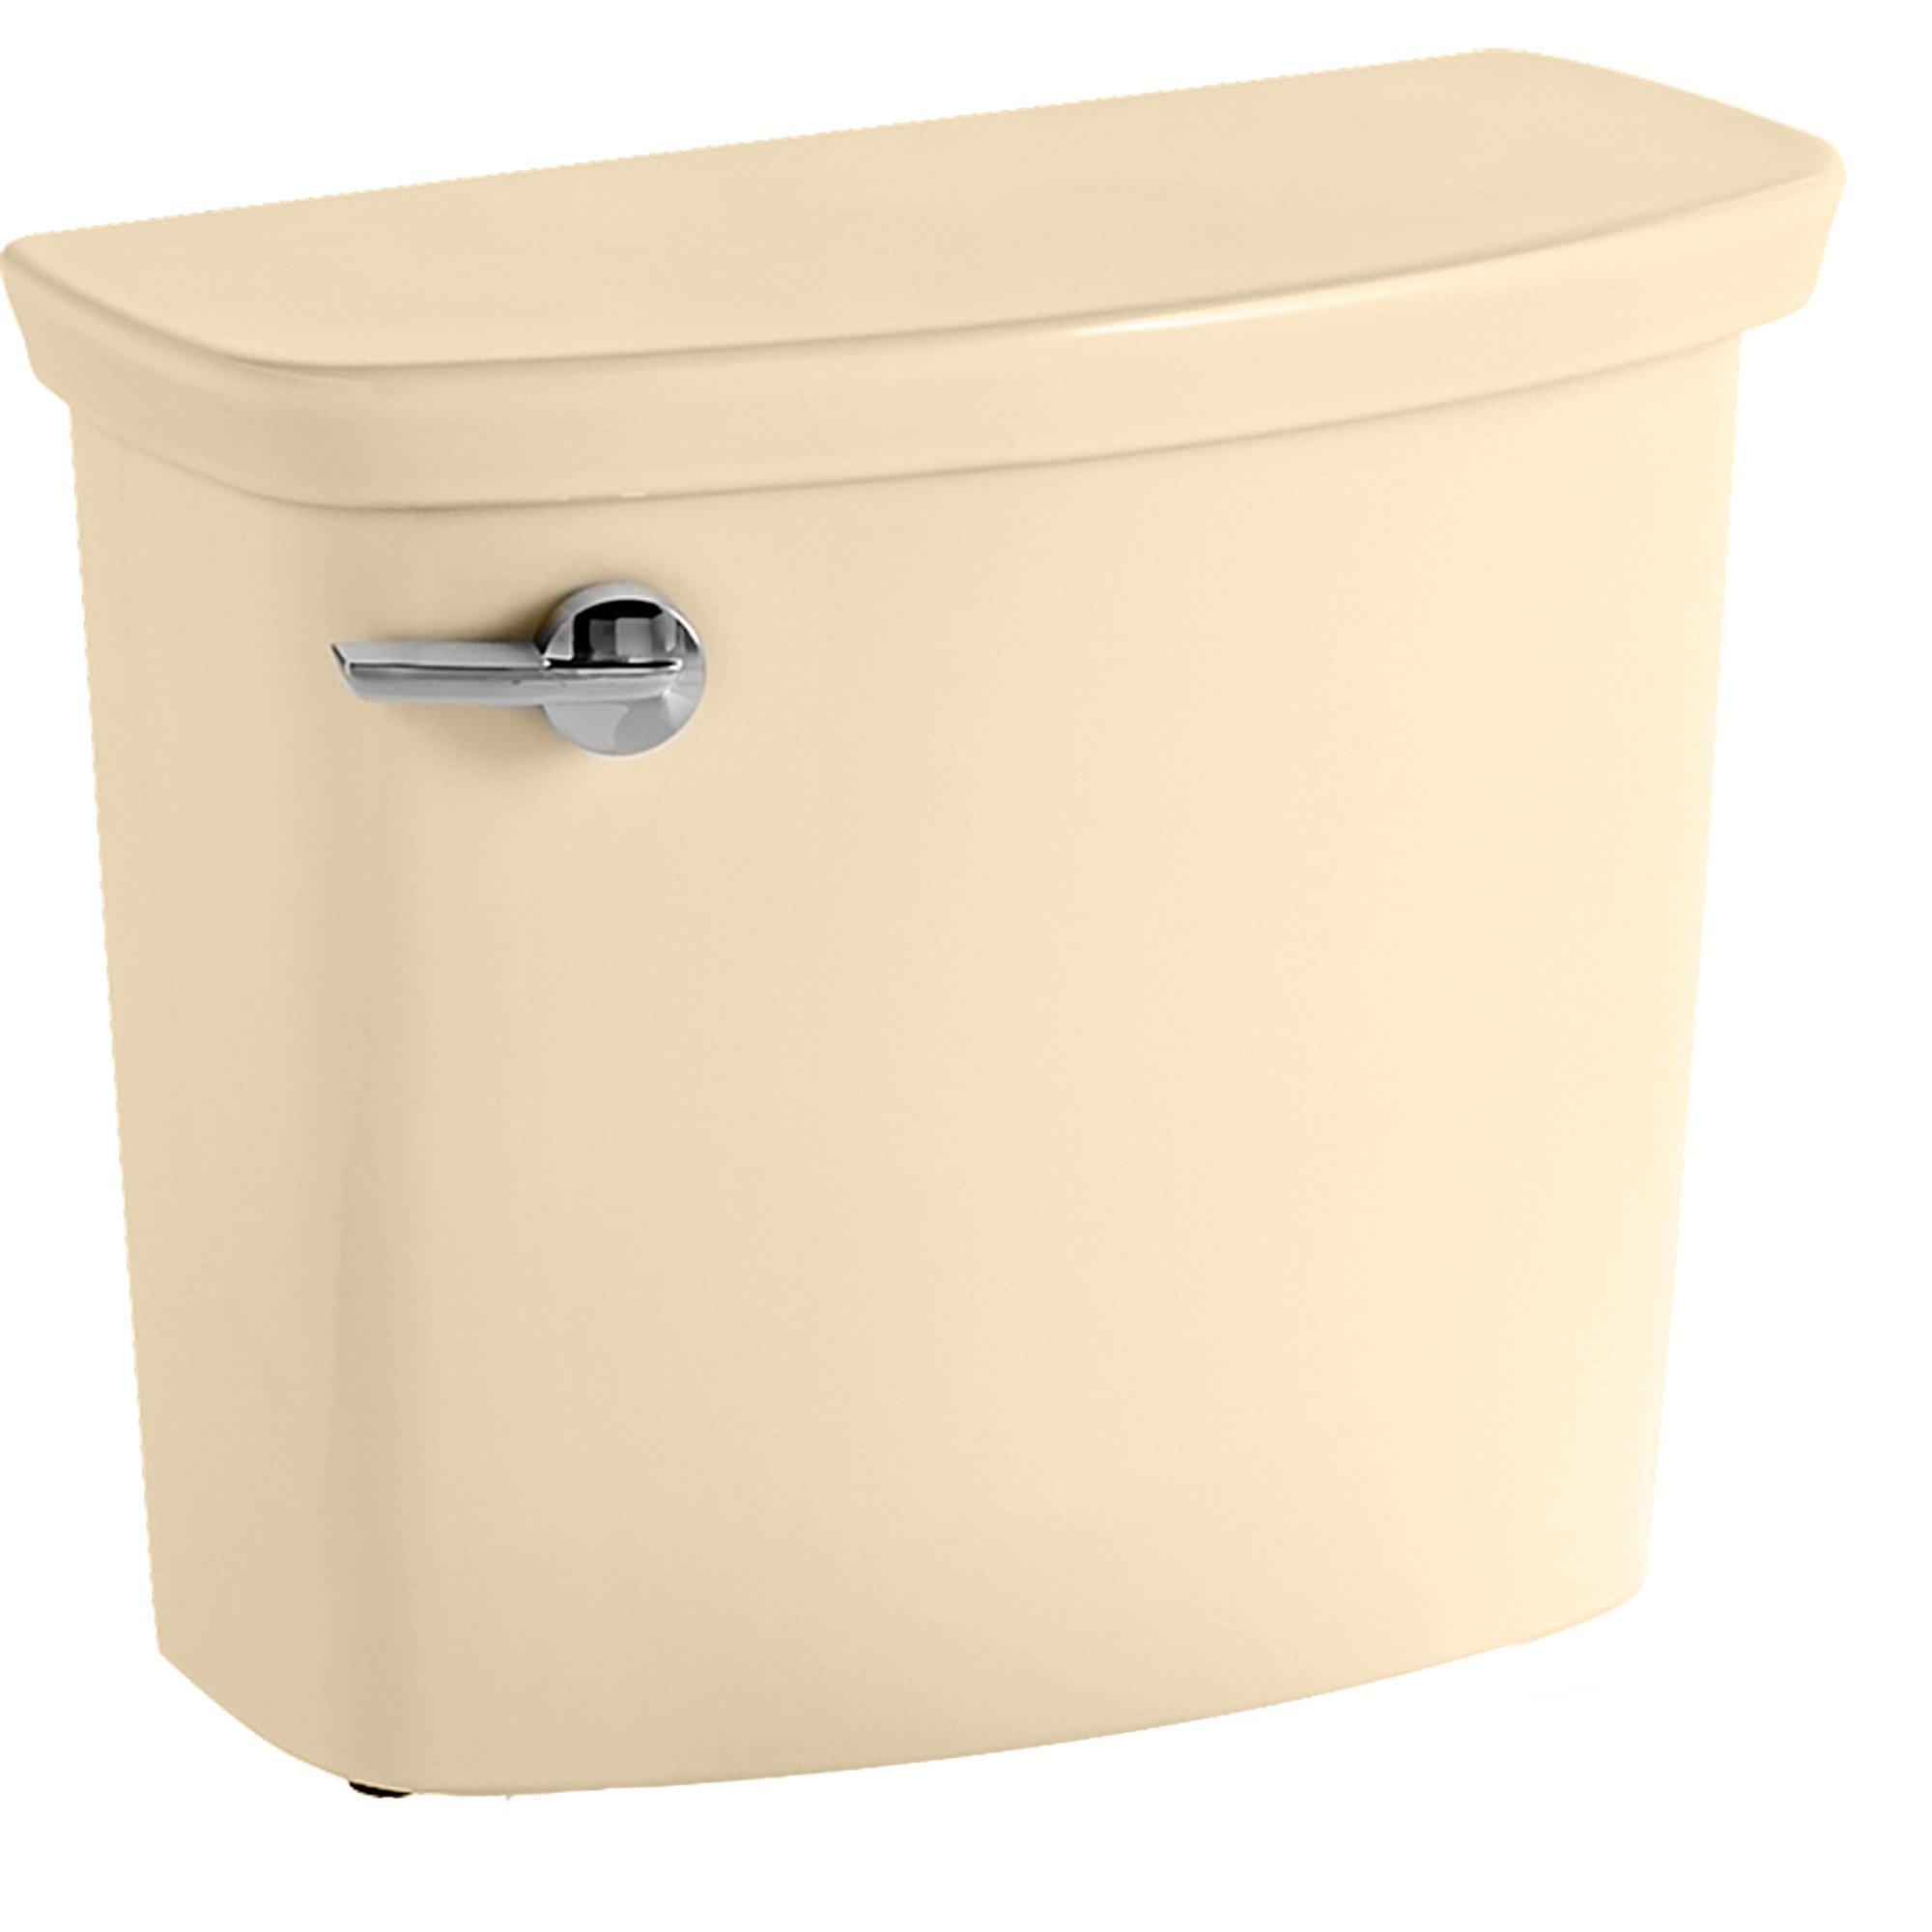 American Standard 4385A104.021 Vormax High Efficiency Toilet Tank Bone